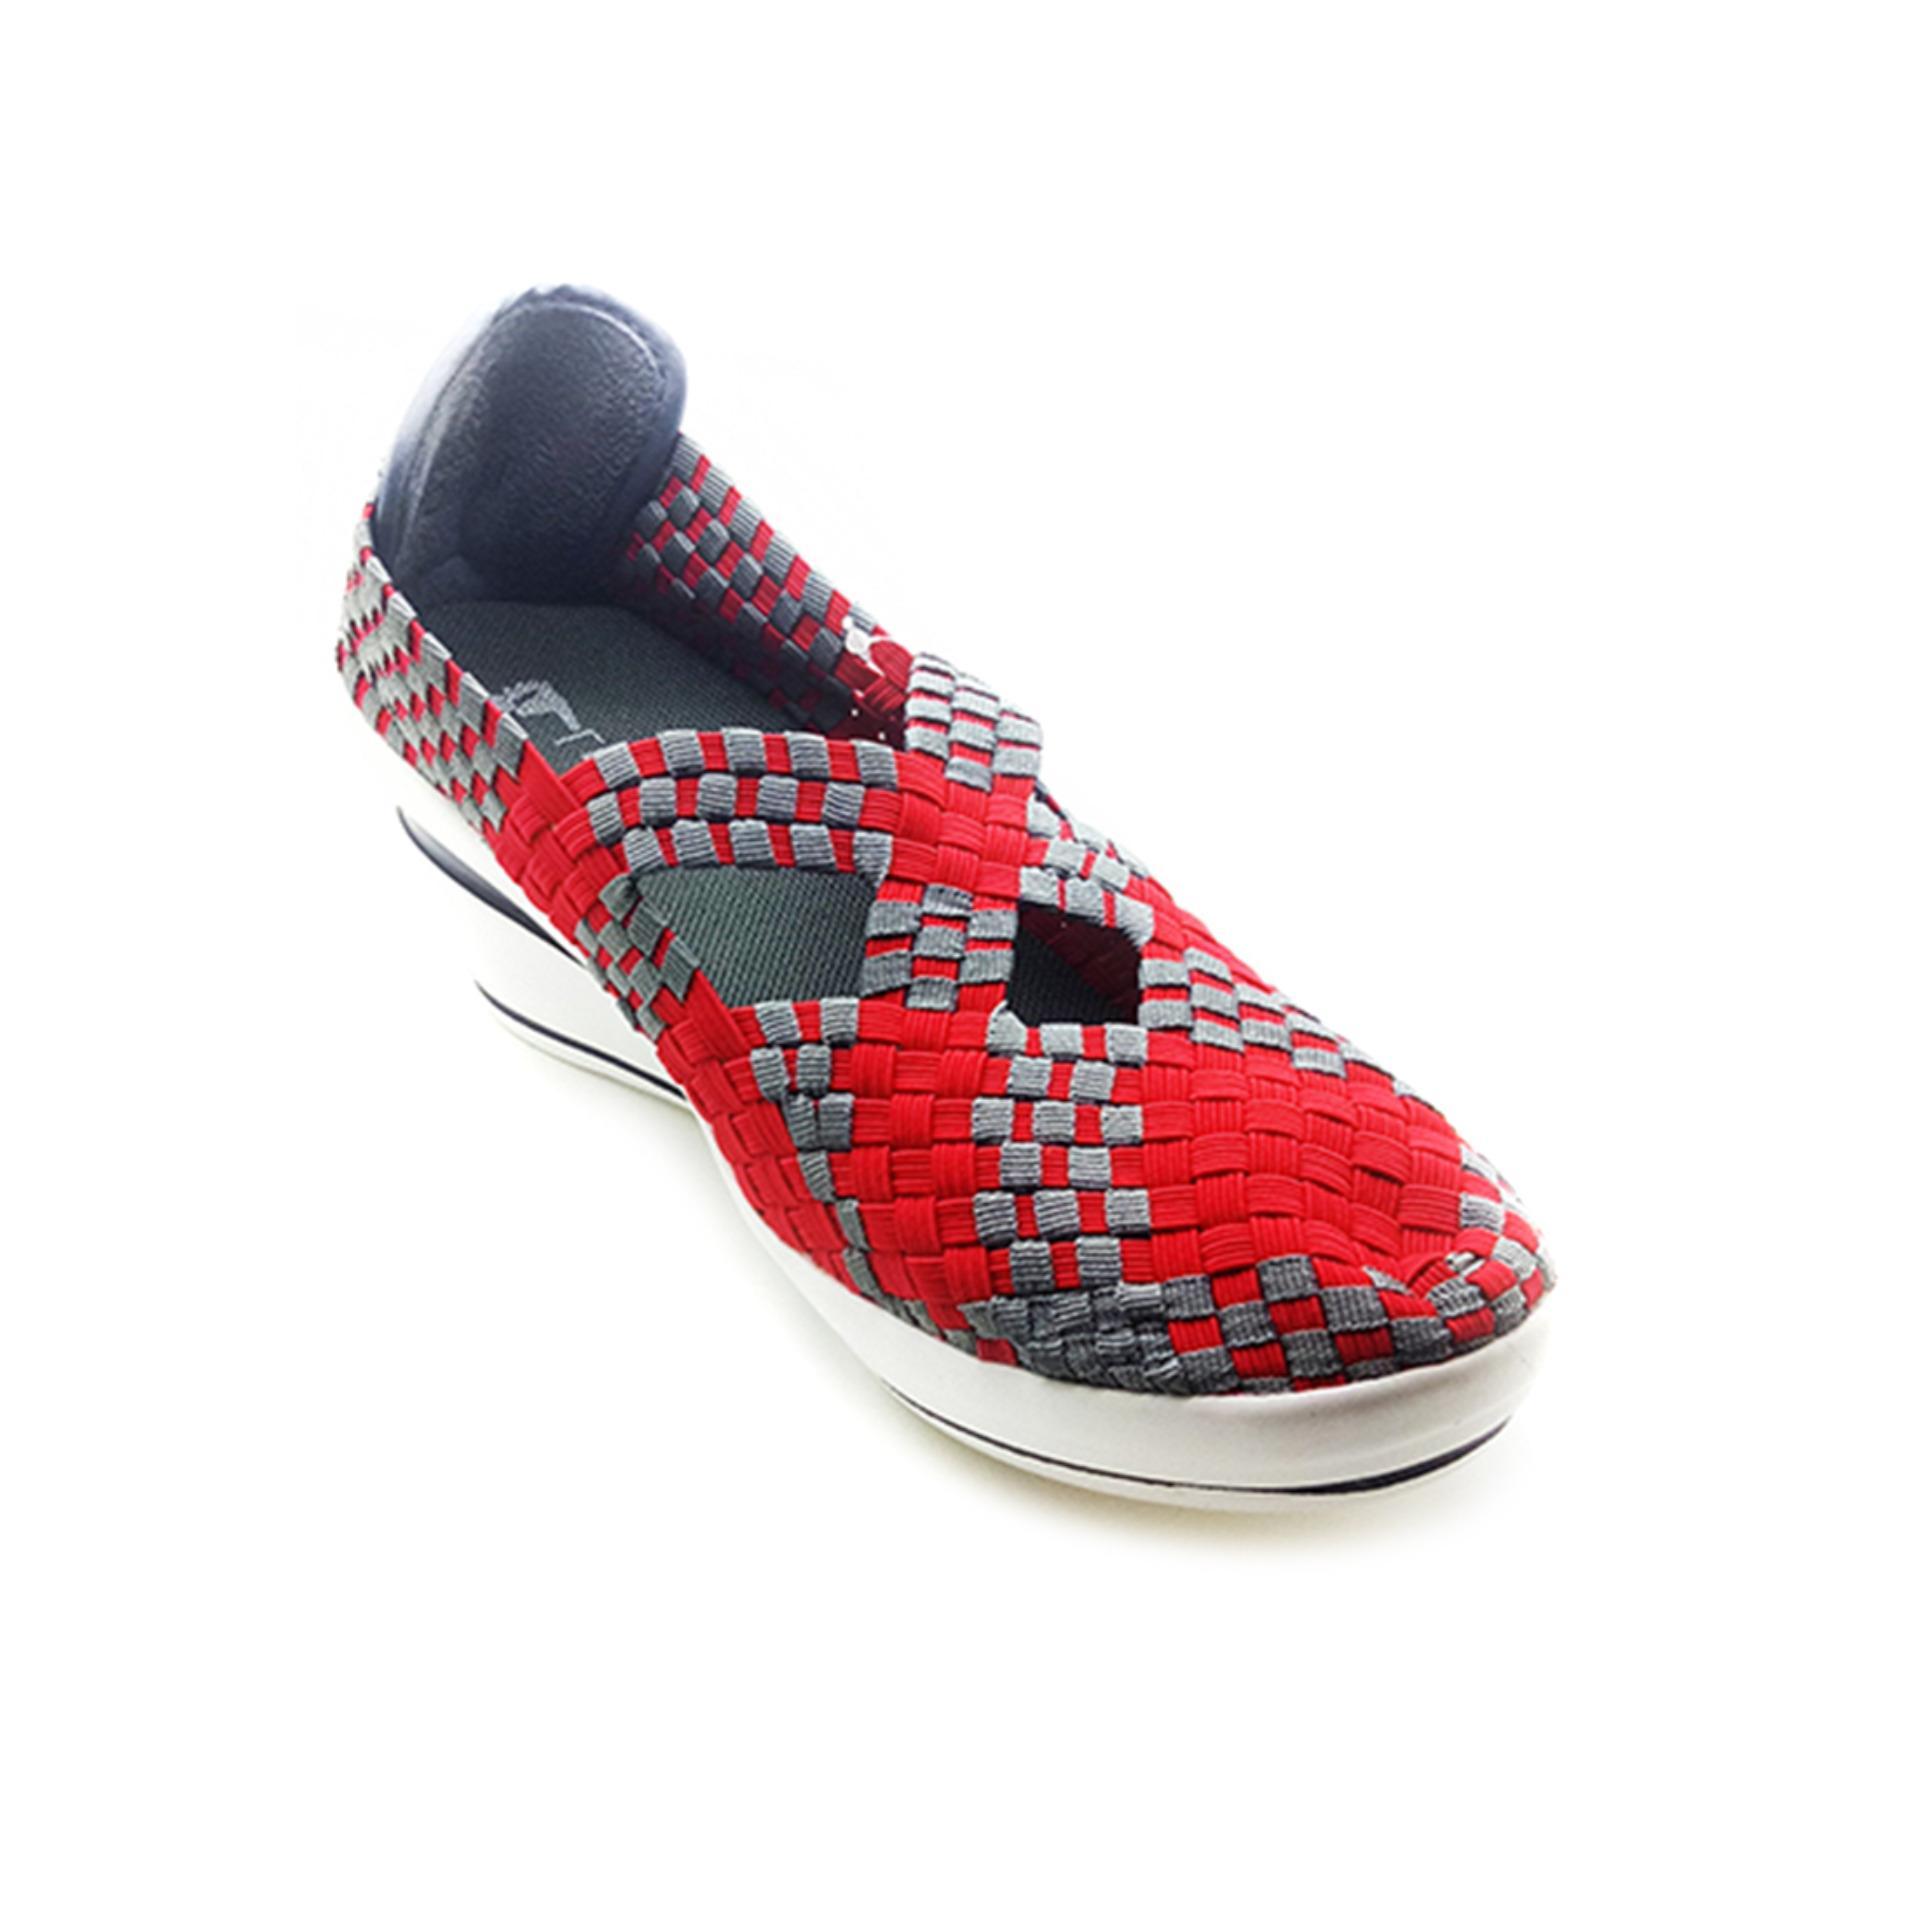 Lulia Wedges Sepatu Rajut Vs3222 Merah Asli